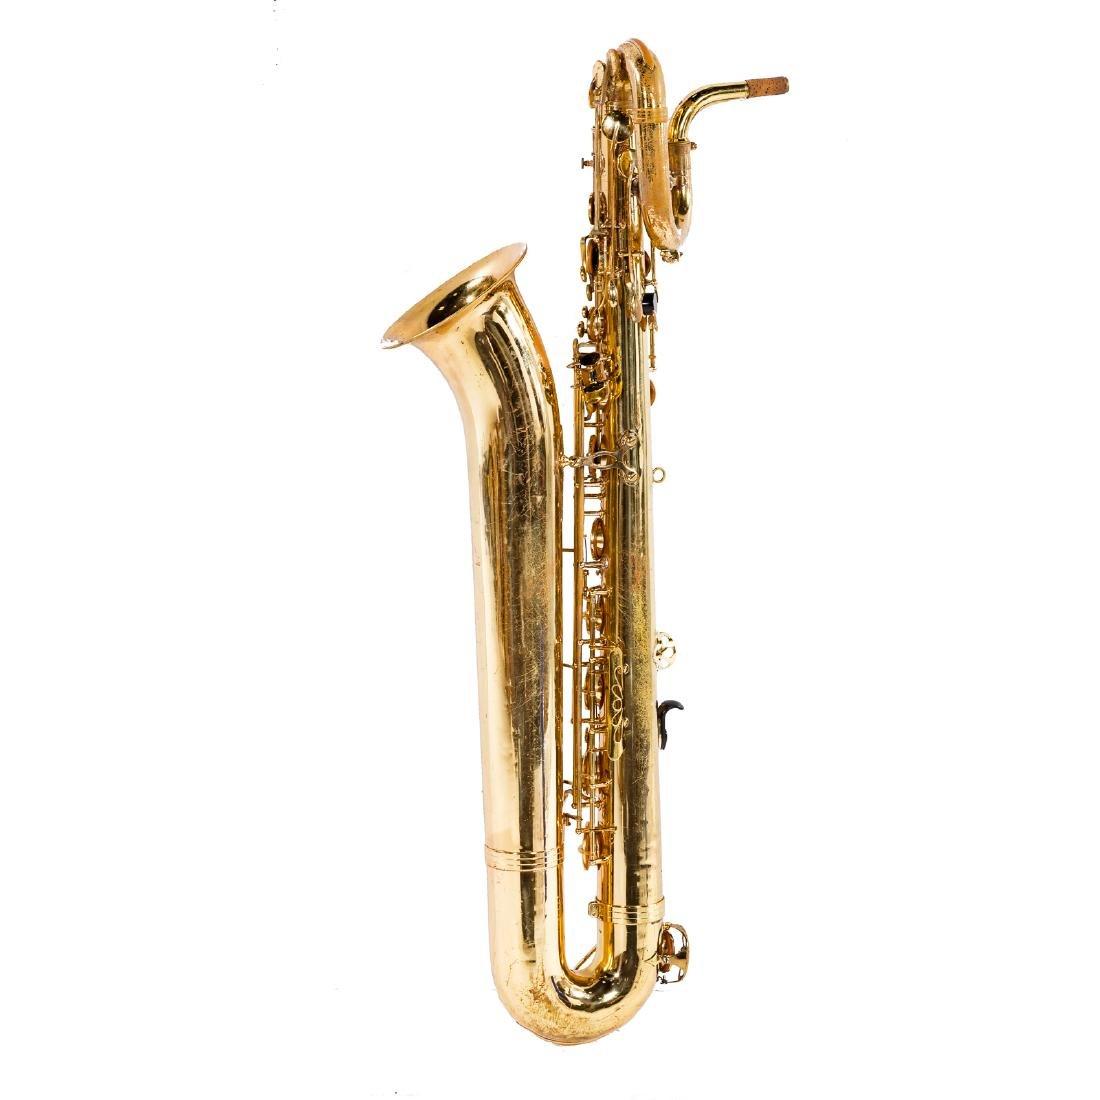 K.H.S. Jupiter alto saxophone - 2